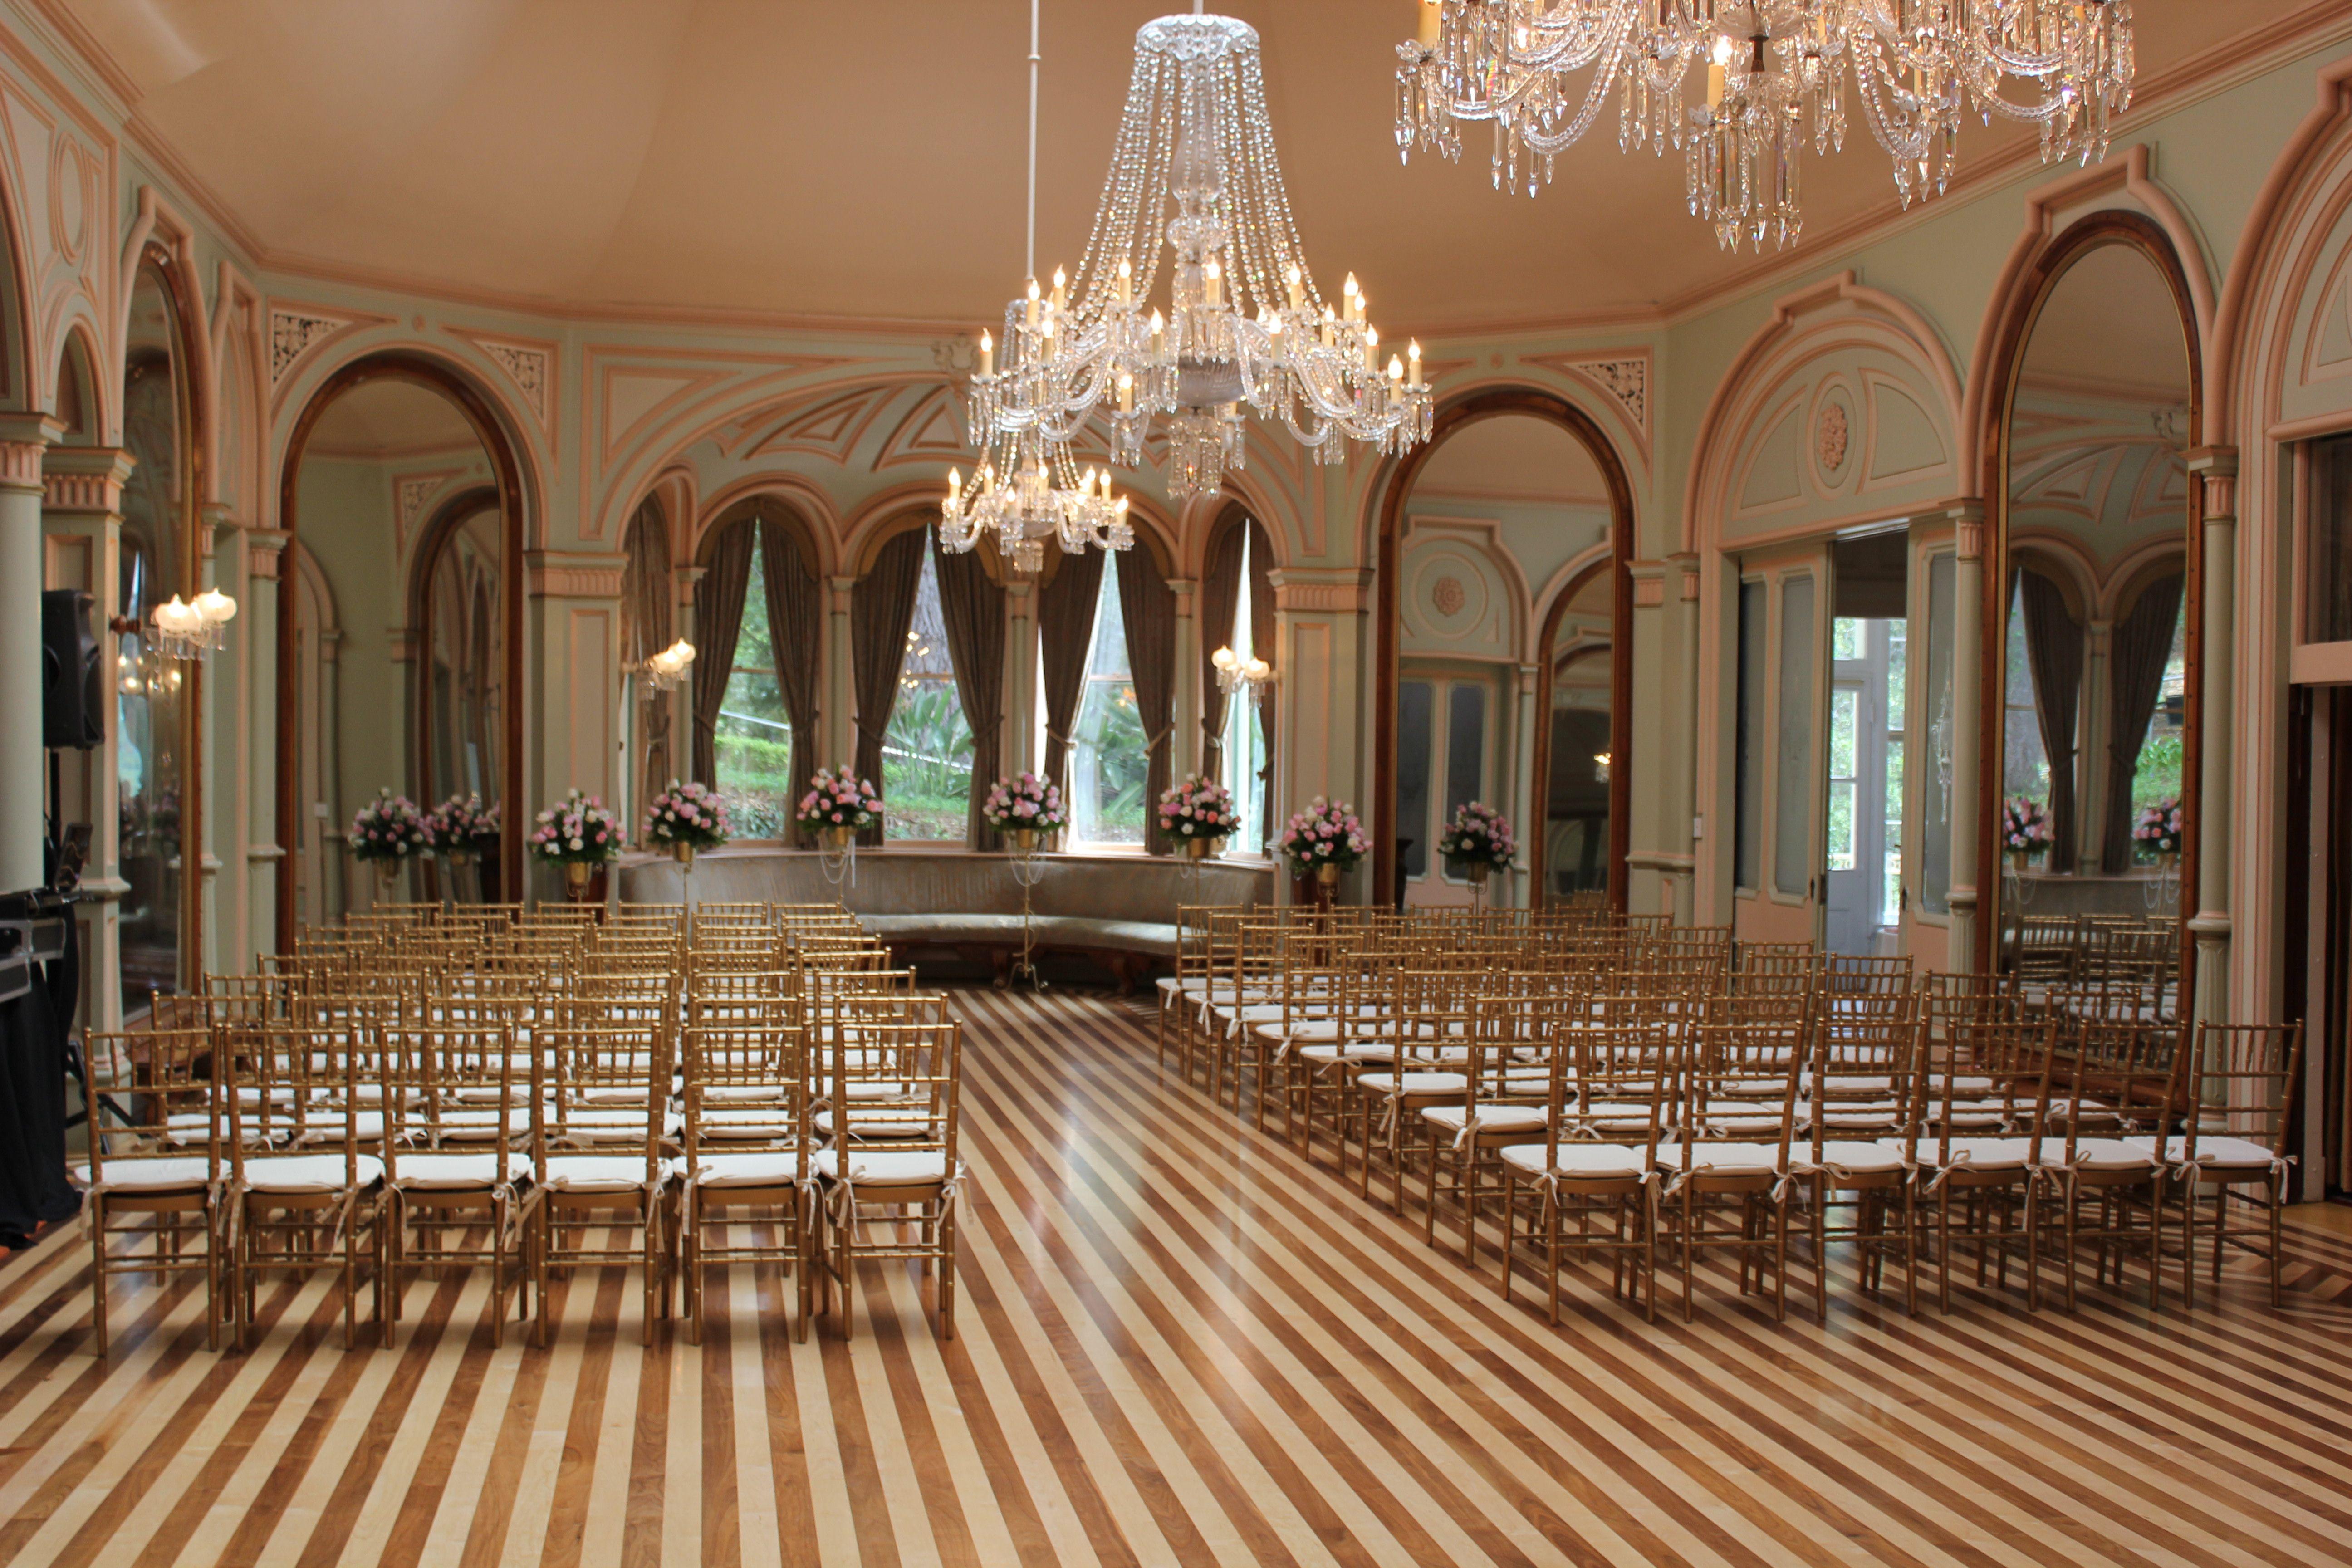 Our Venue Ralston Hall Mansion Mansions Affair Wedding Venues Reception